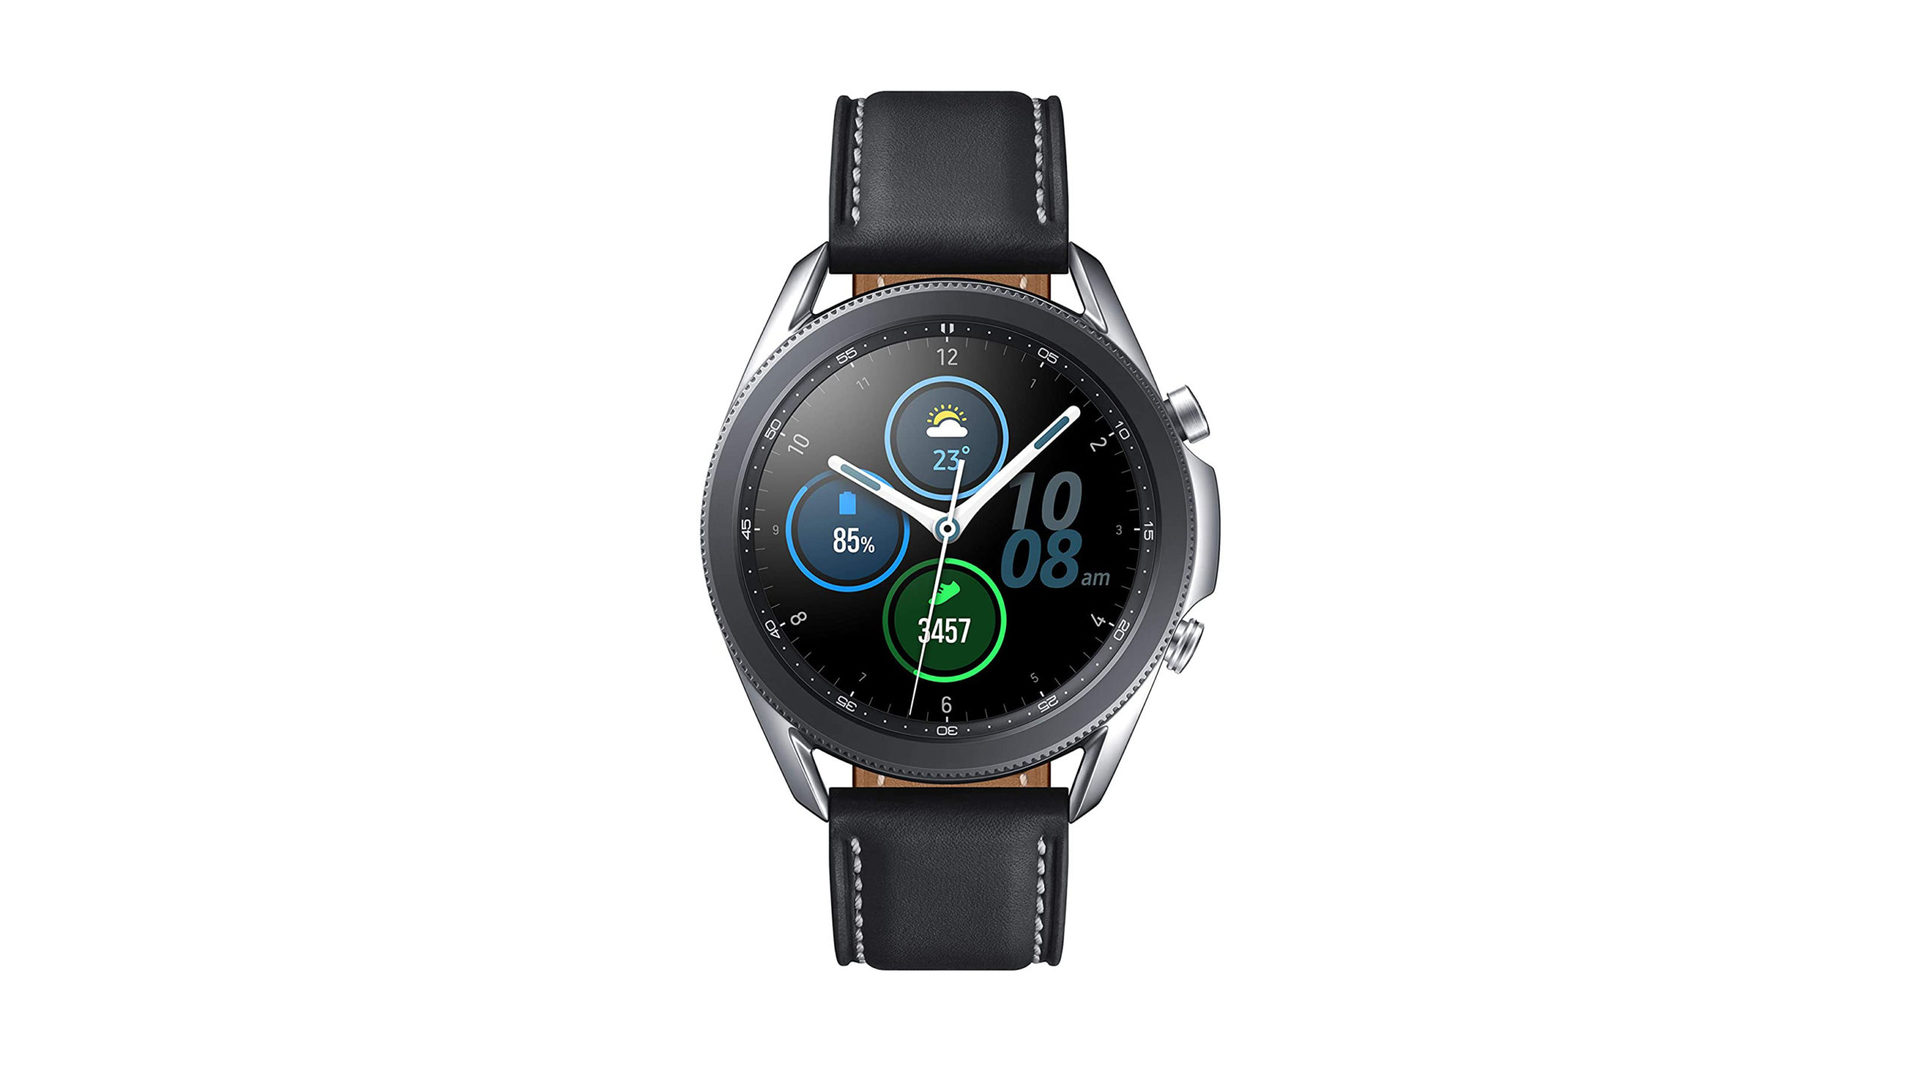 đồng hồ samsung galaxy 3 dây da đen